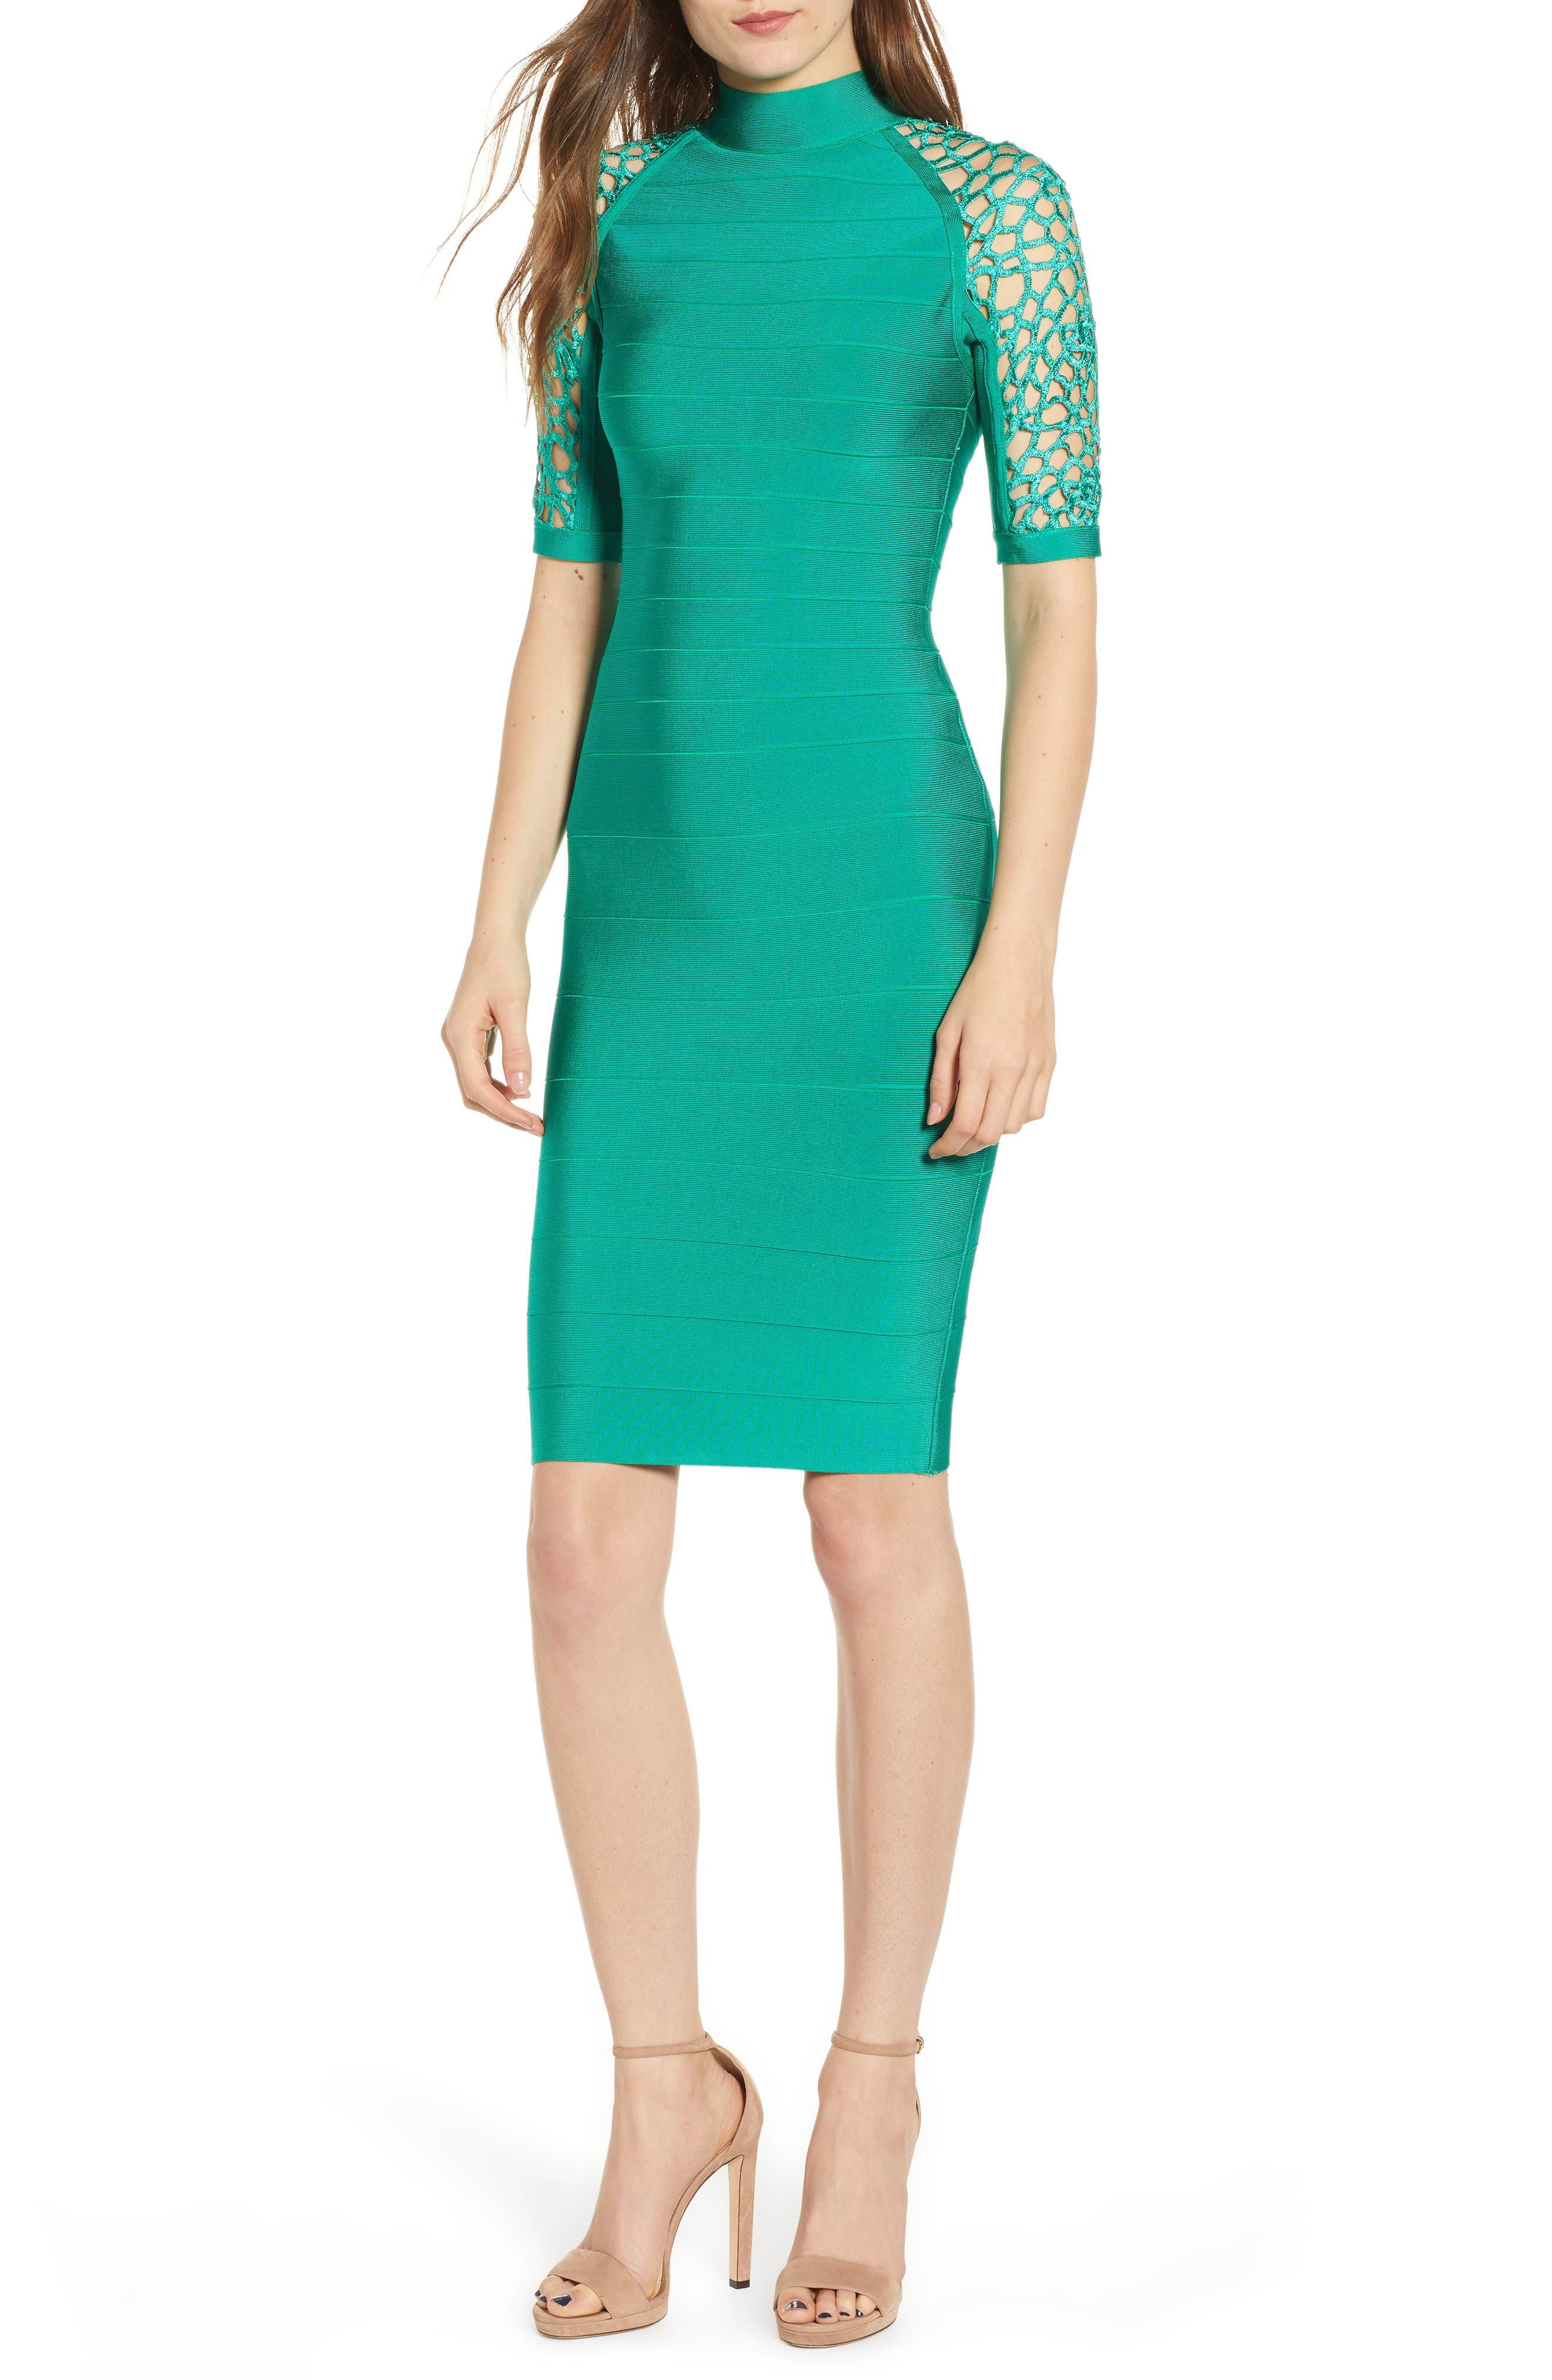 SENTIMENTAL NY Bandage Body-Con Dress, Main, color, GREEN